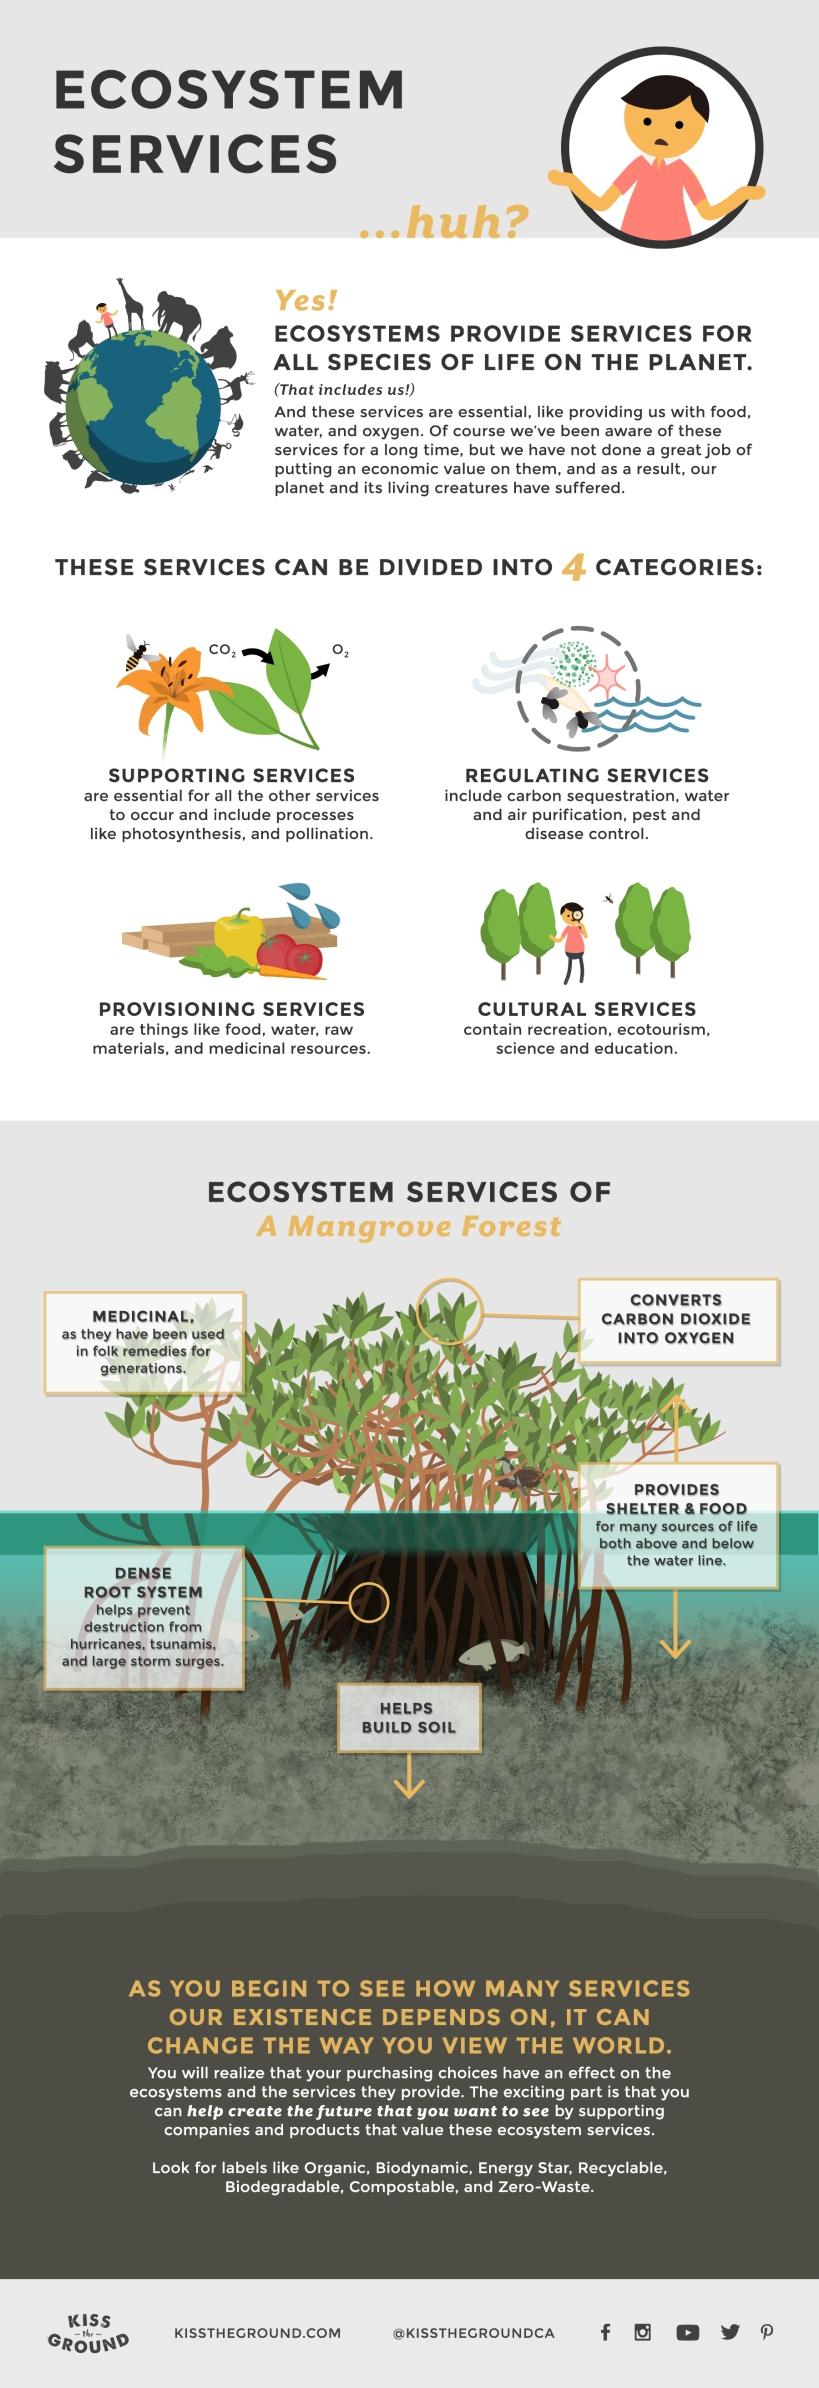 ecosystemservices